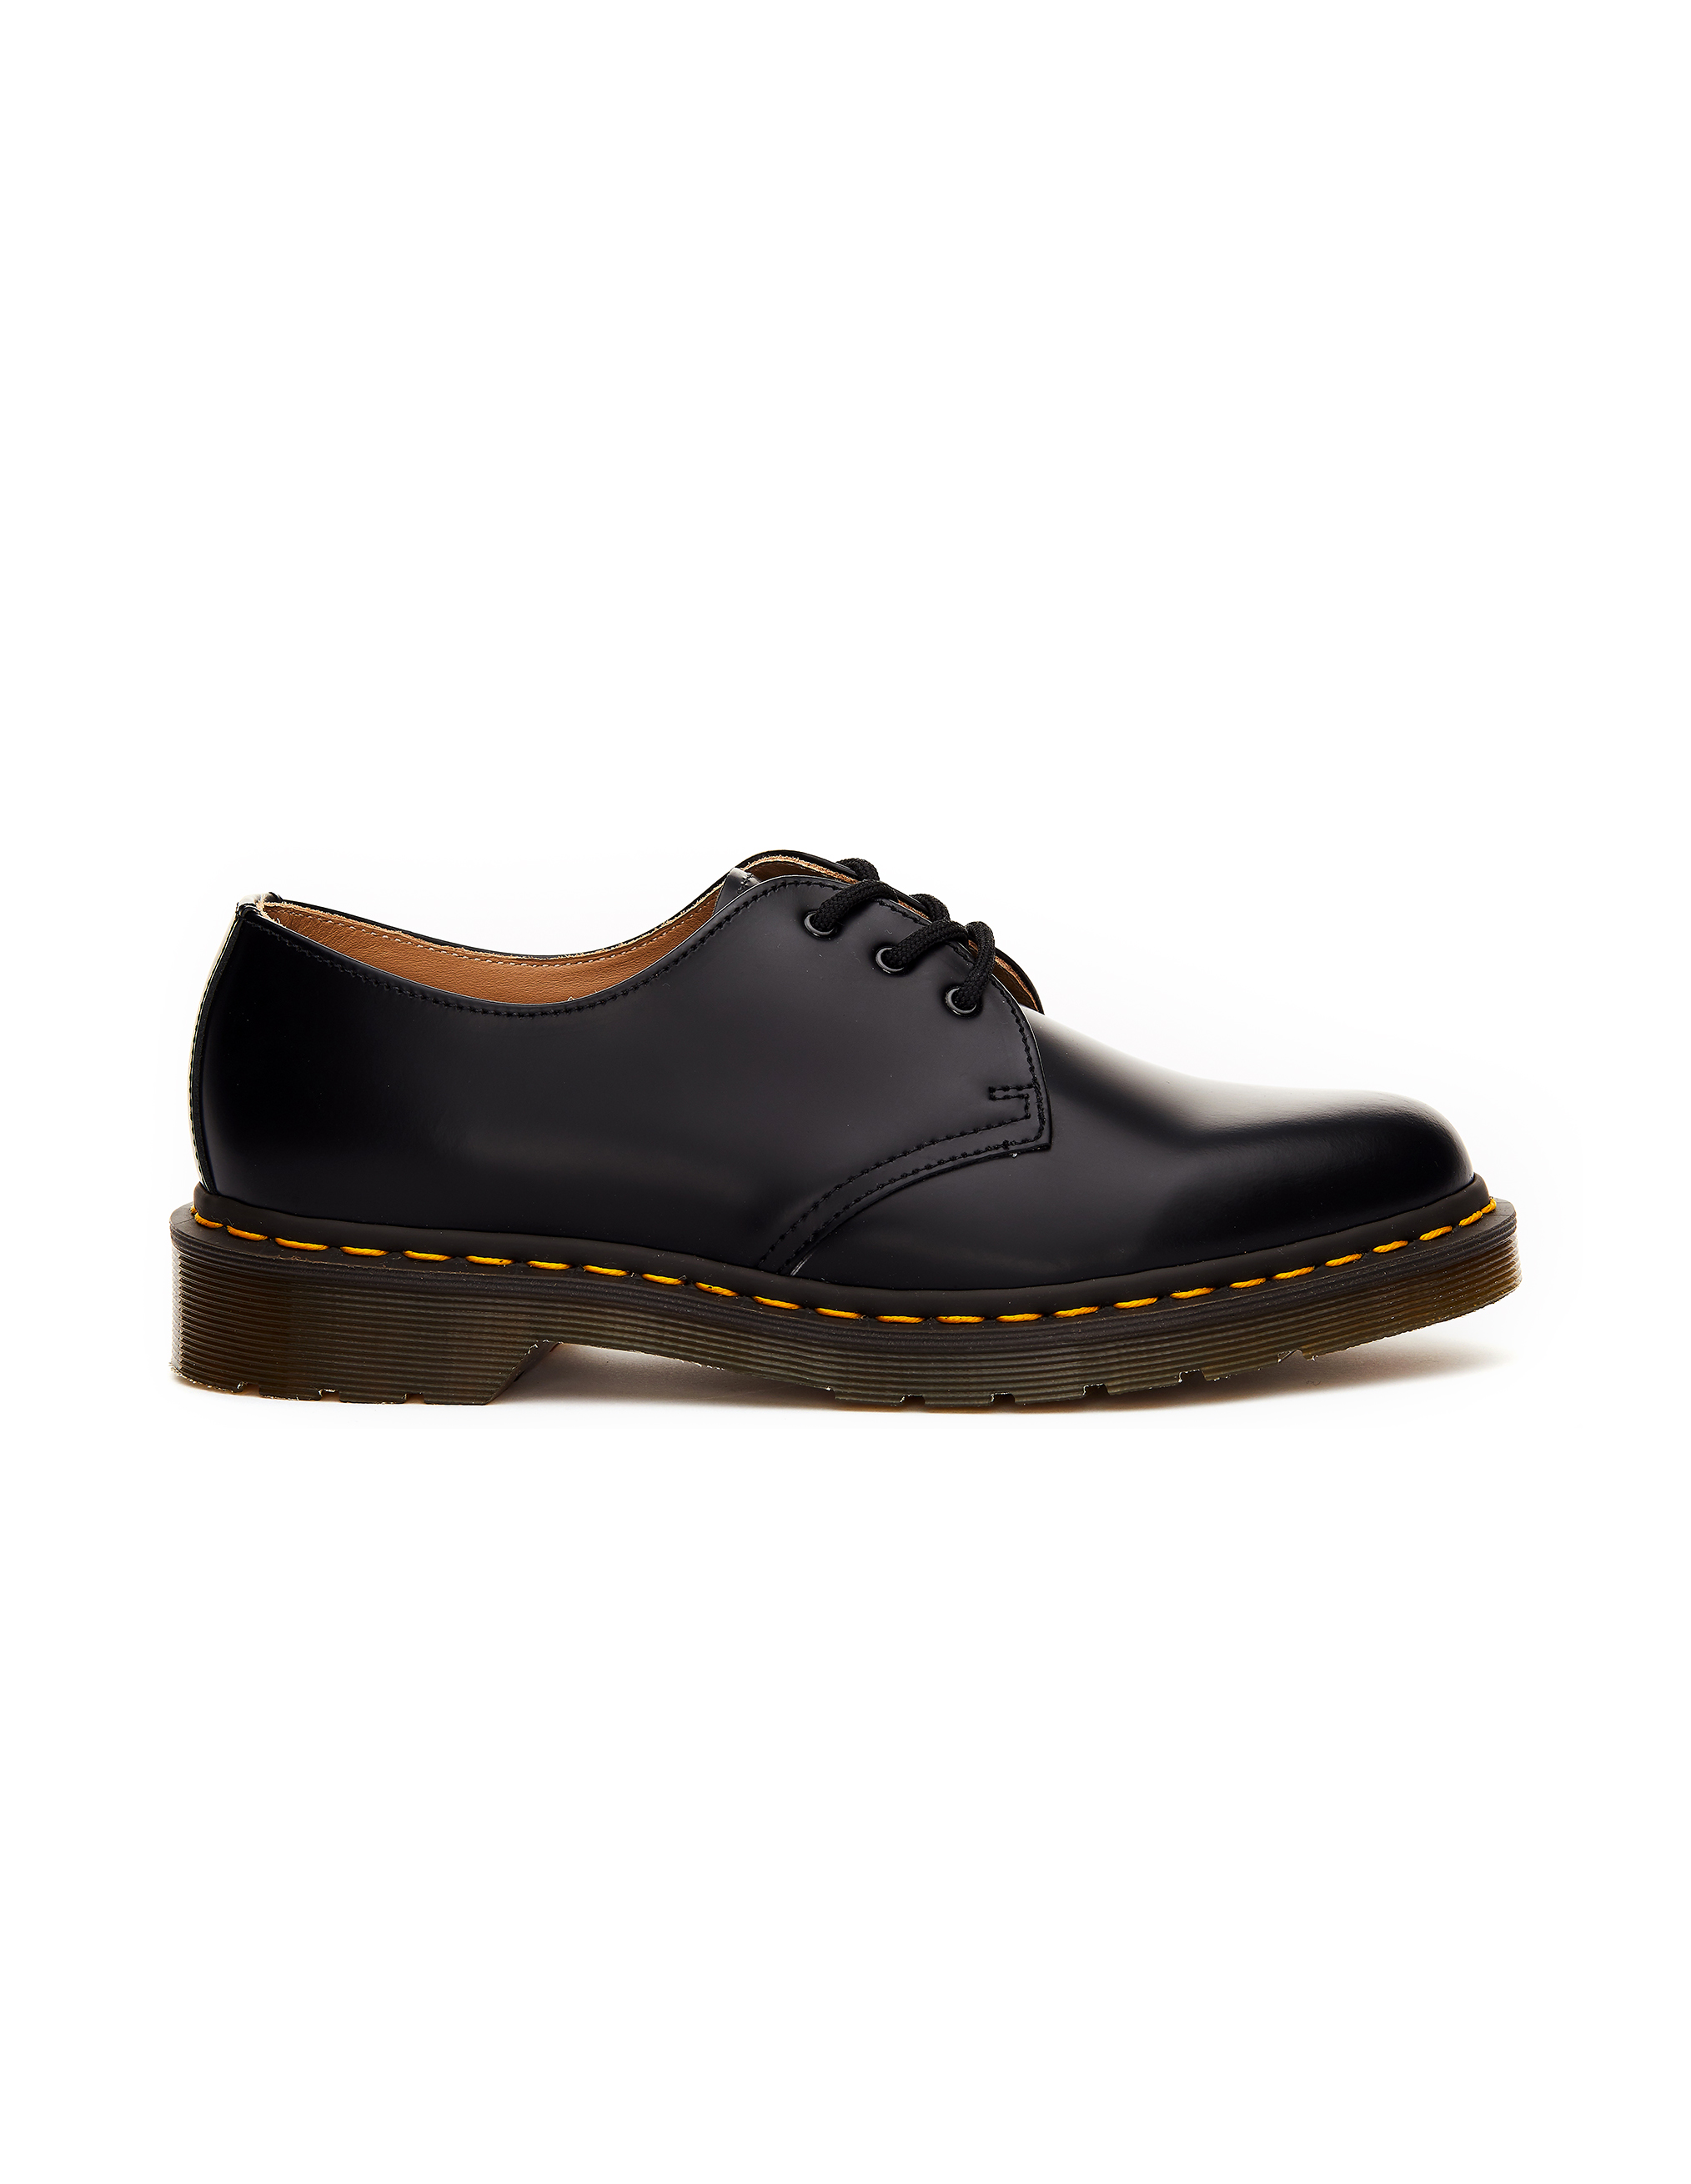 Comme des Garcons CdG Dr.Martens 1461 Black Leather Boots